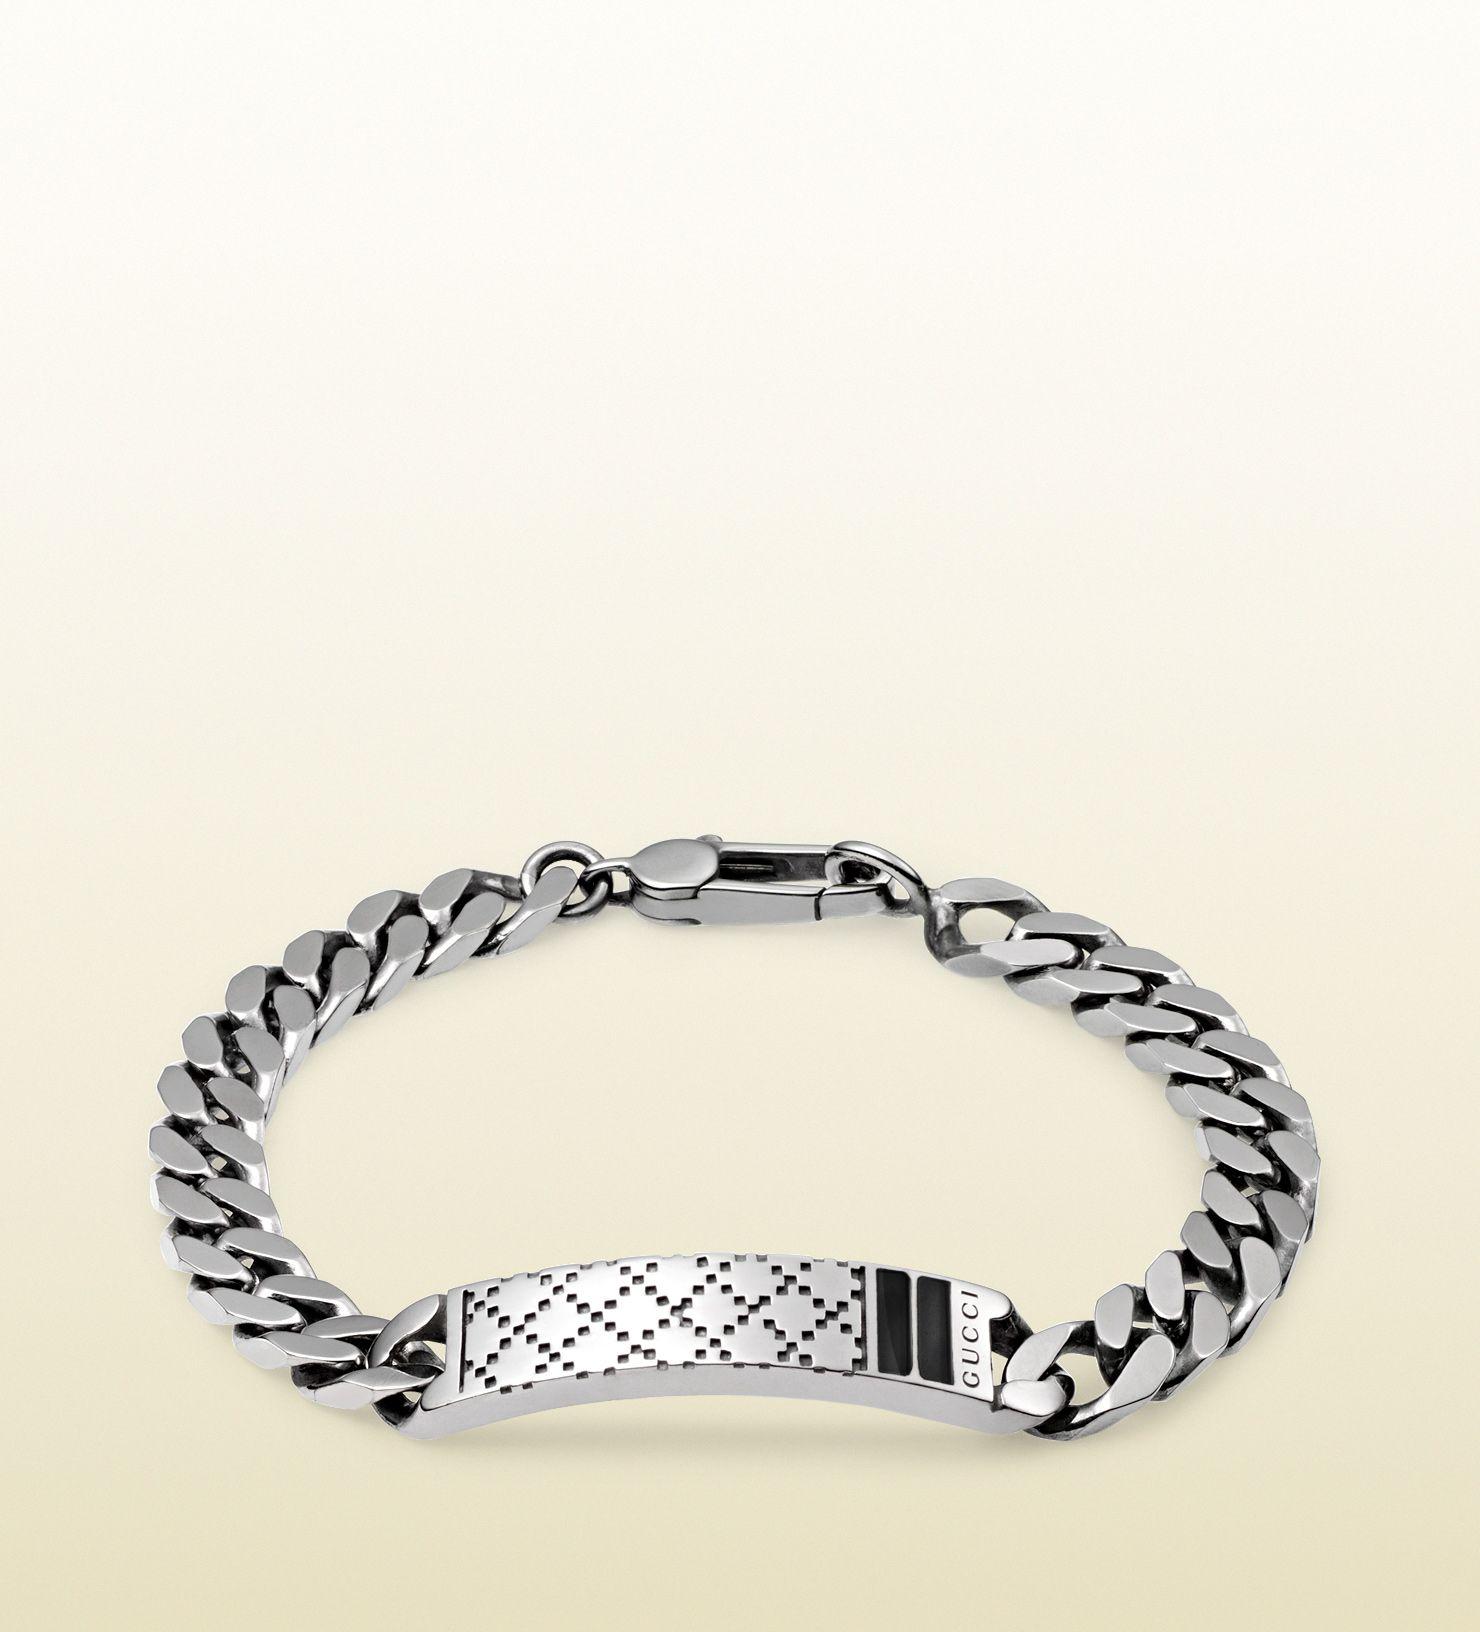 diamantissima bracelet in sterling silver Luxury Pinterest